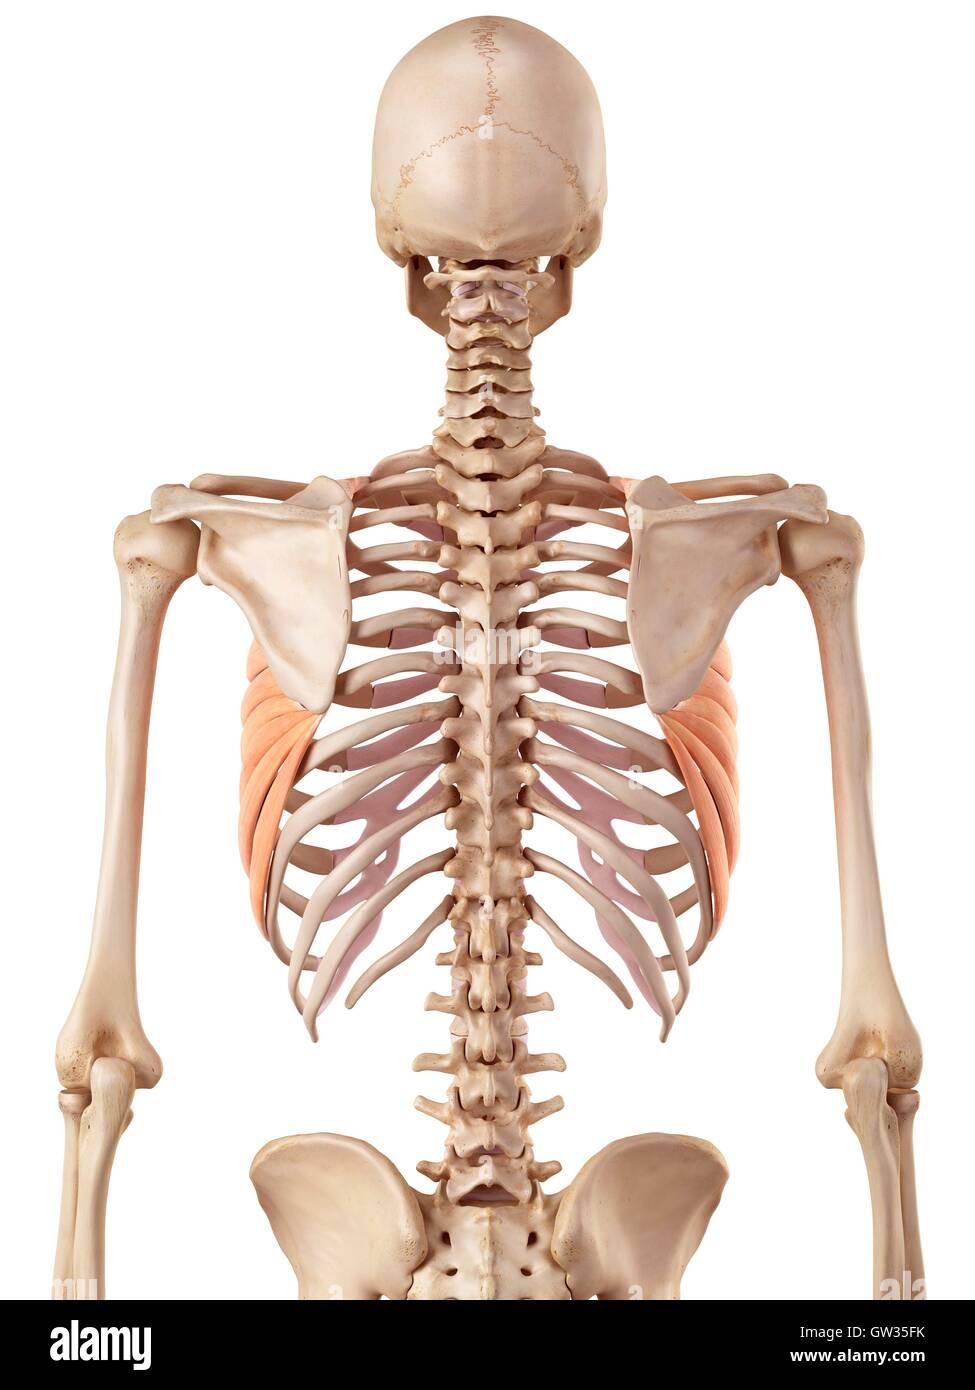 Human rib muscles, illustration Stock Photo: 118698823 - Alamy